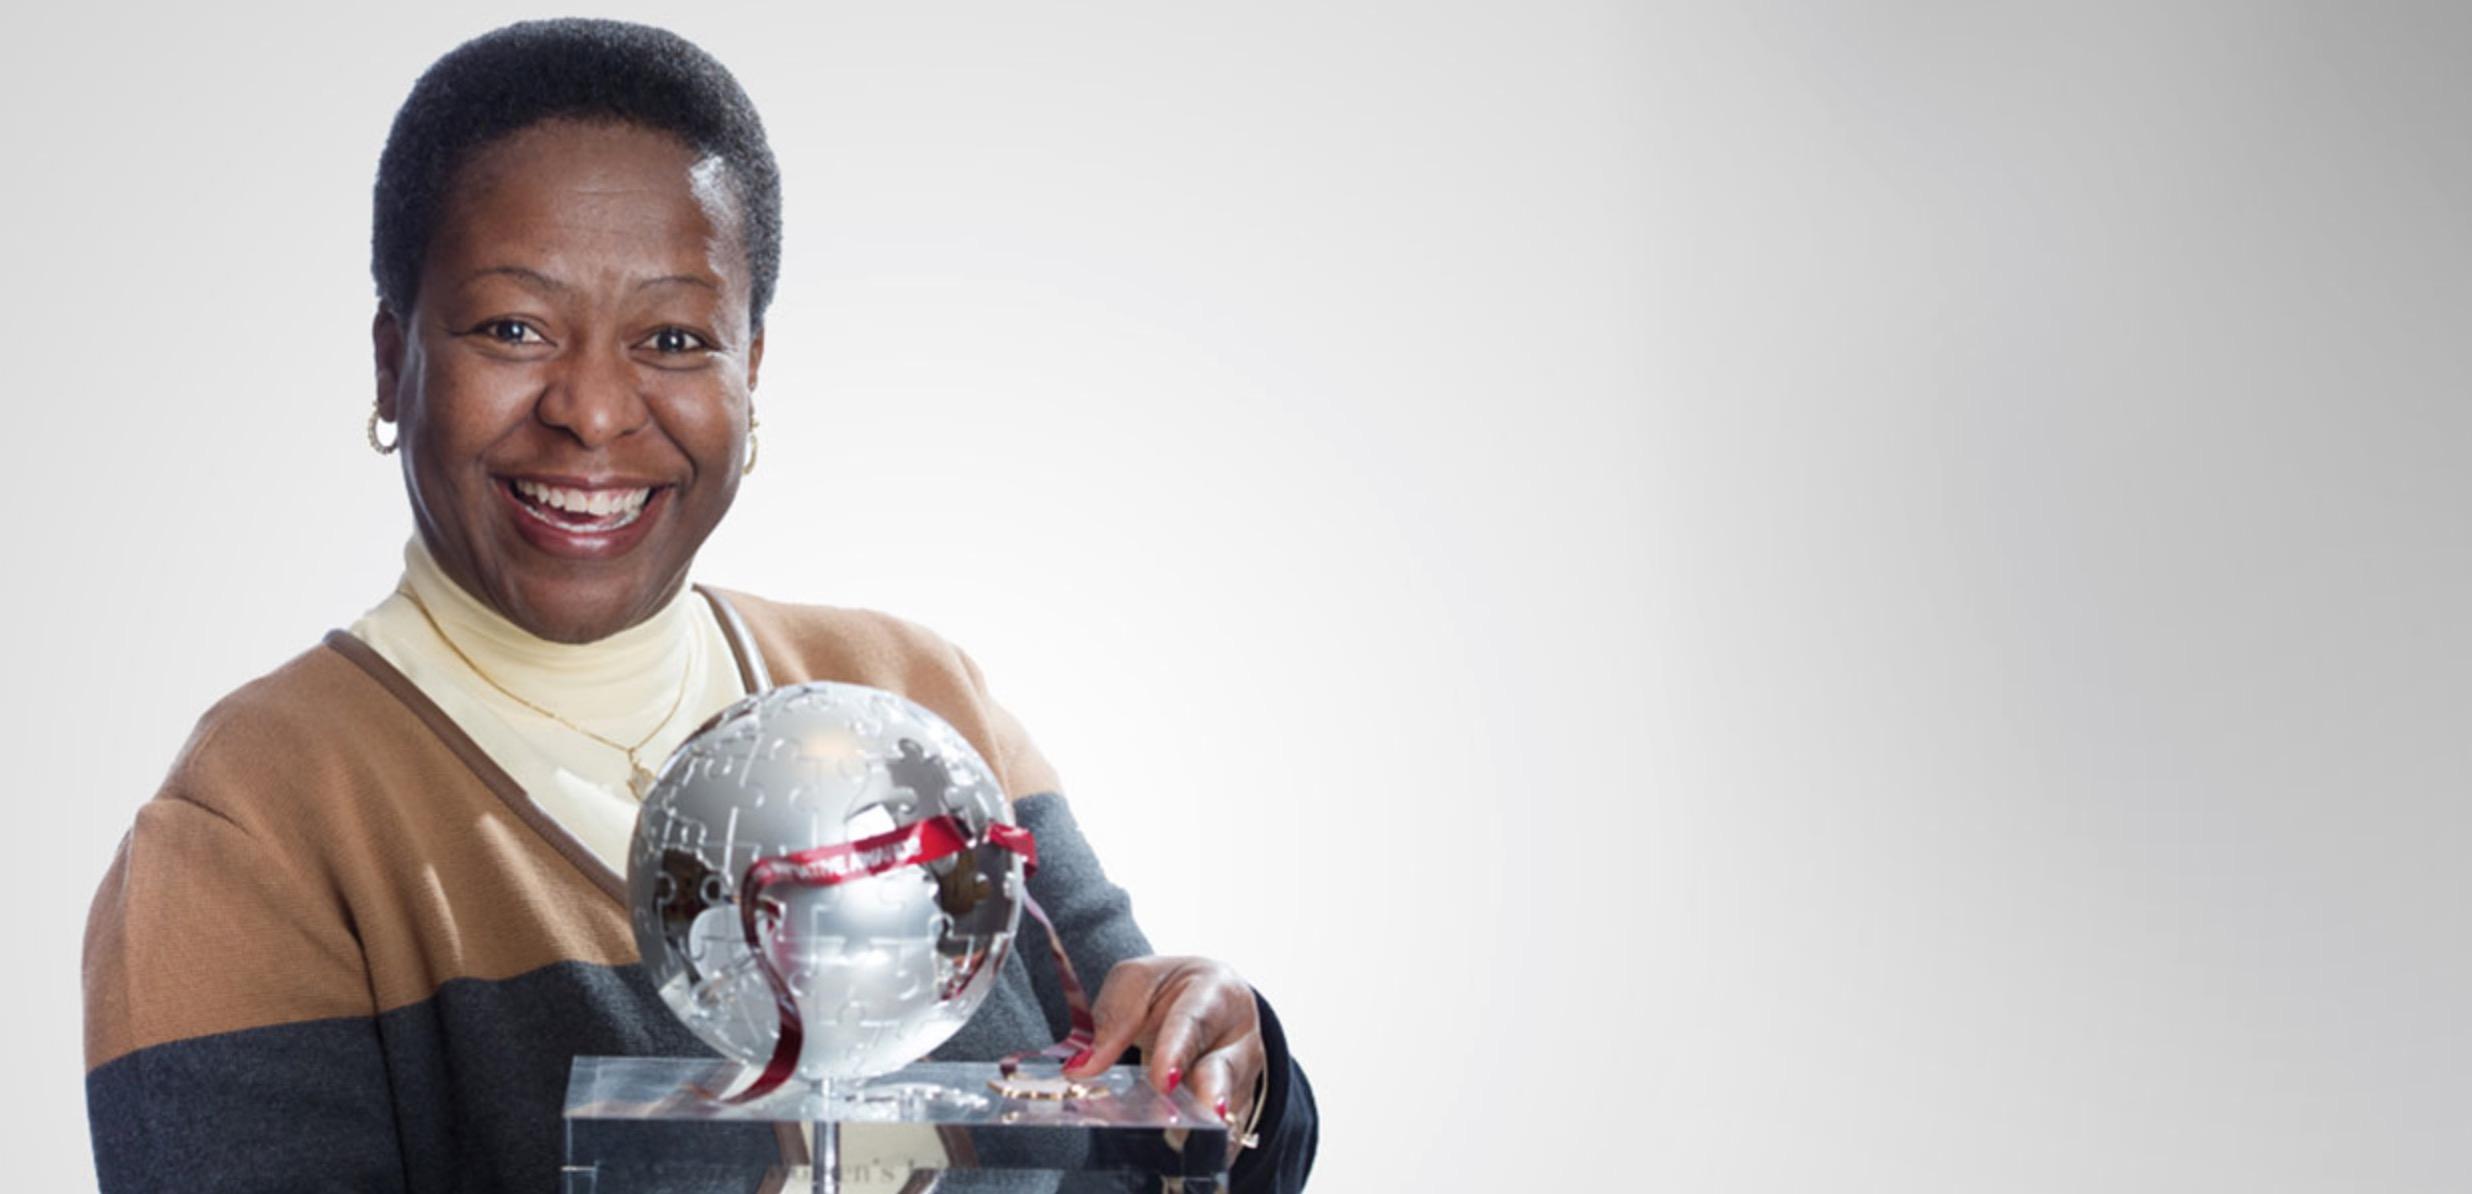 Chinwe Ohajuruka ,founder Comprehensive Design Services, Nigeria